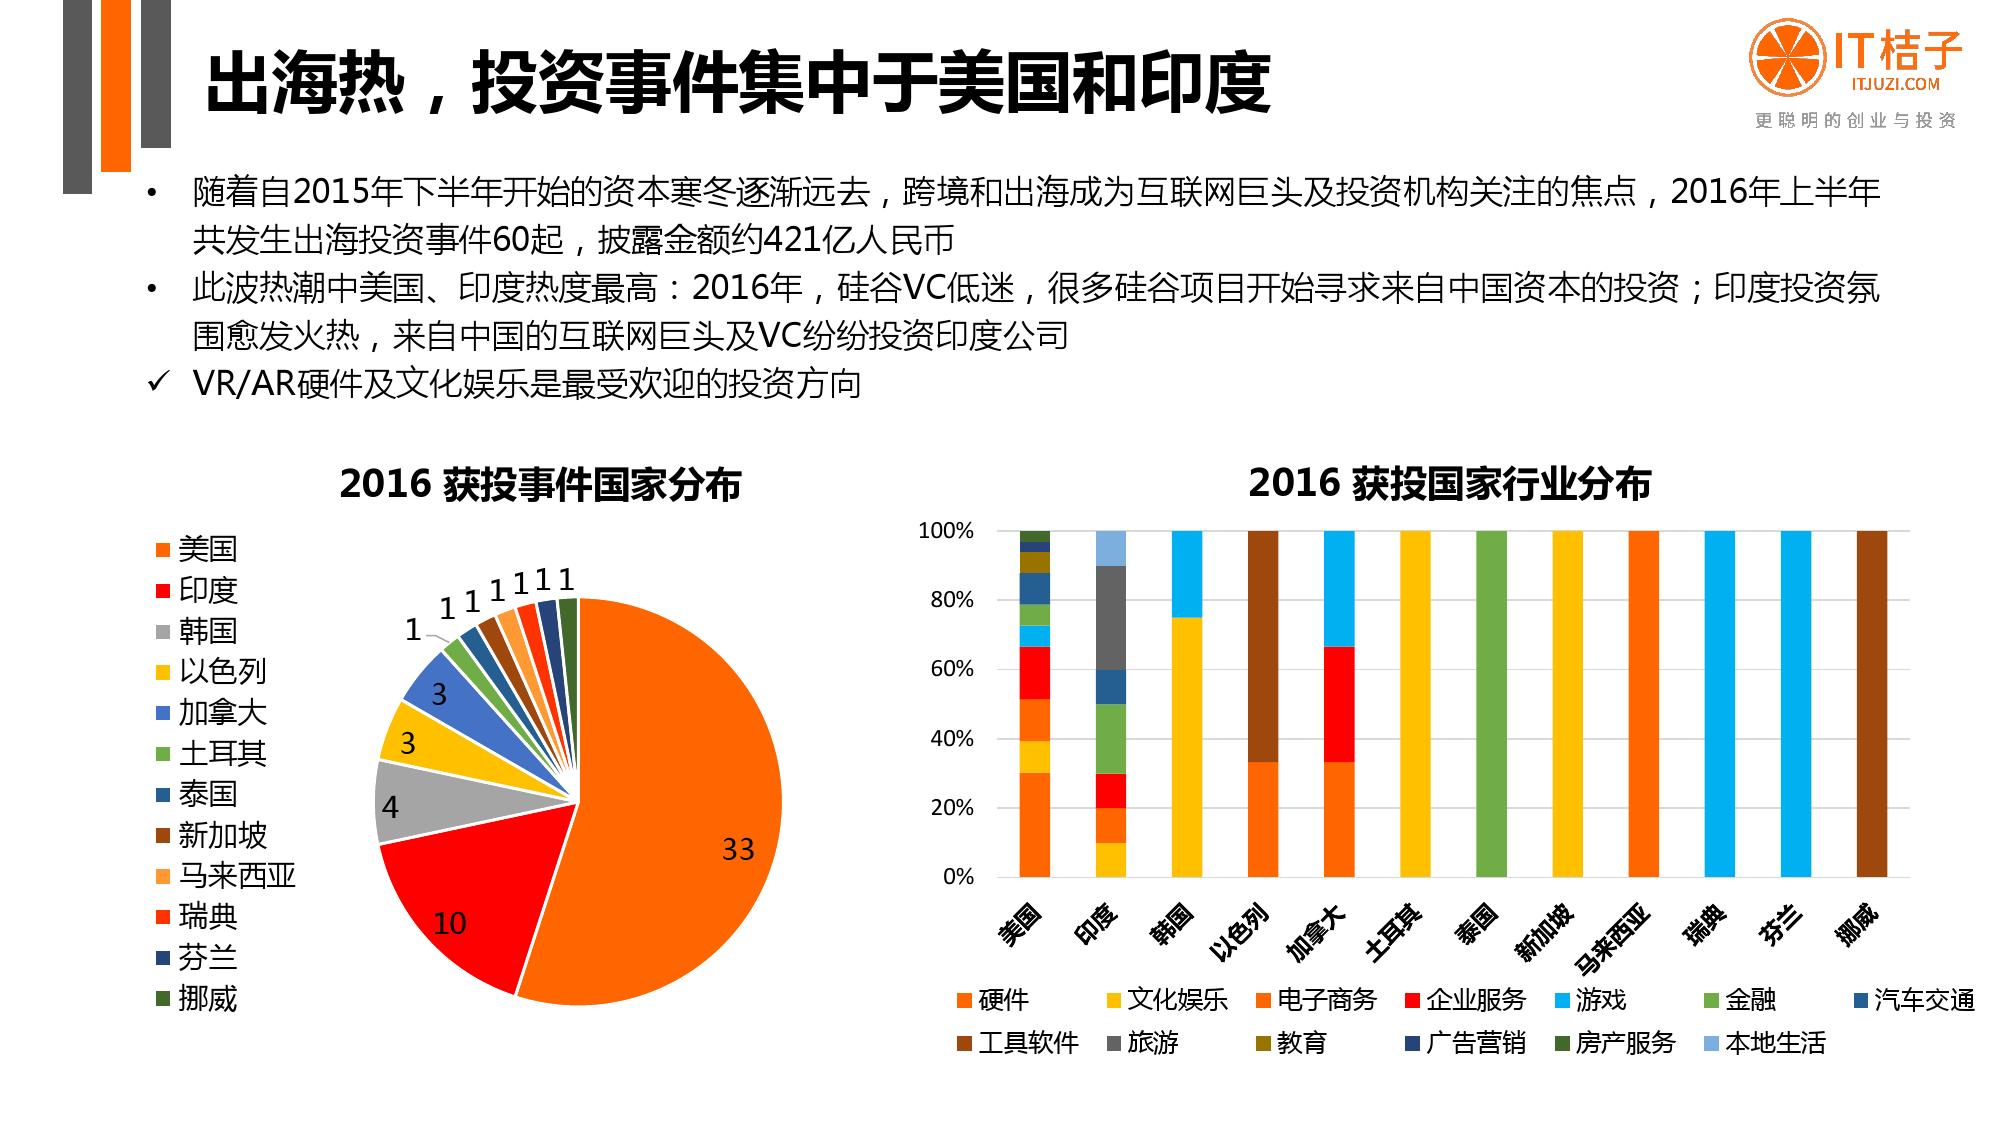 【IT桔子】2016年Q2中国互联网创业投资分析报告_000047